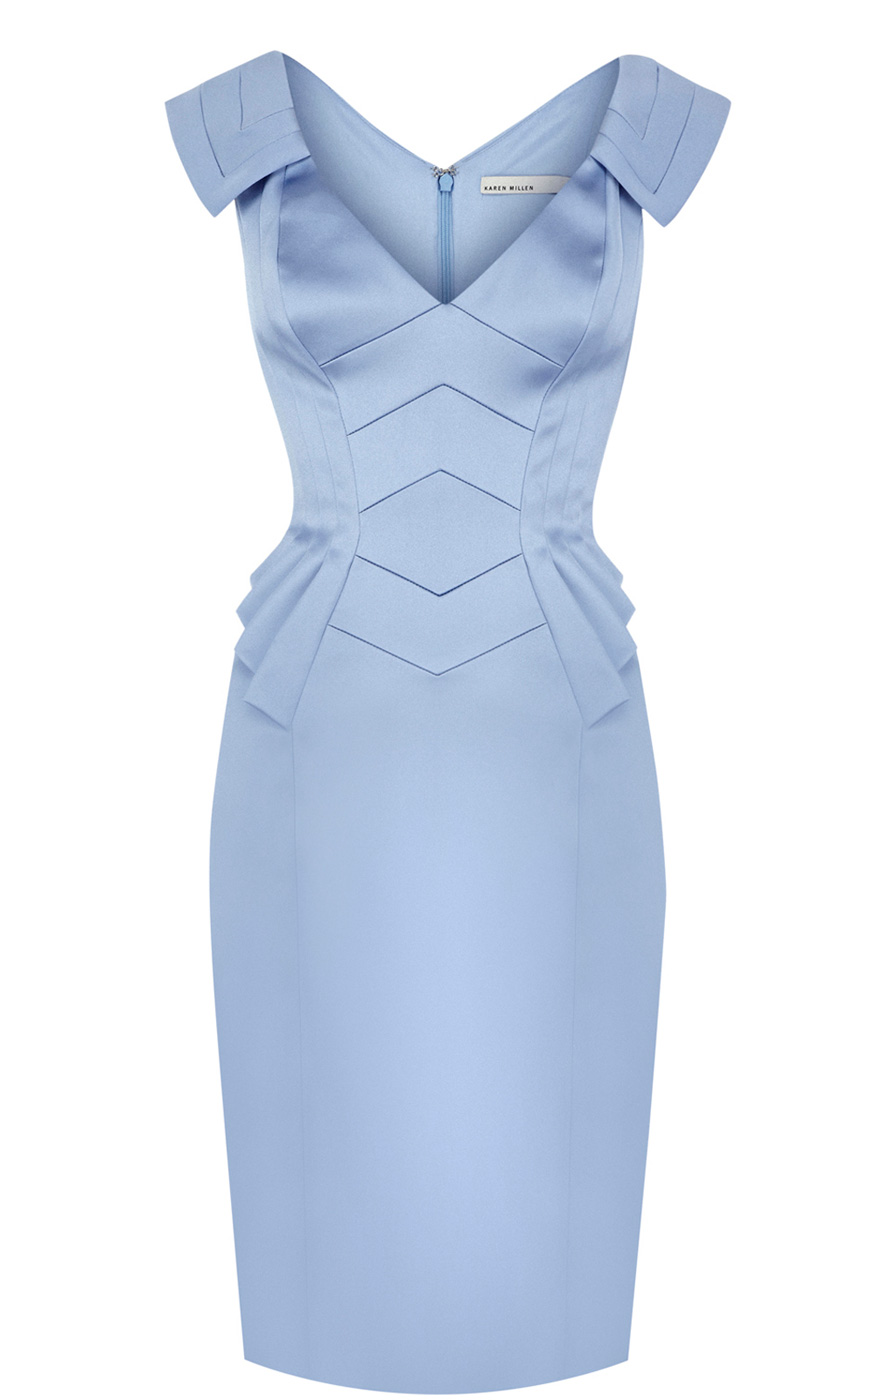 Karen Millen Peplum Dress in Blue - Lyst